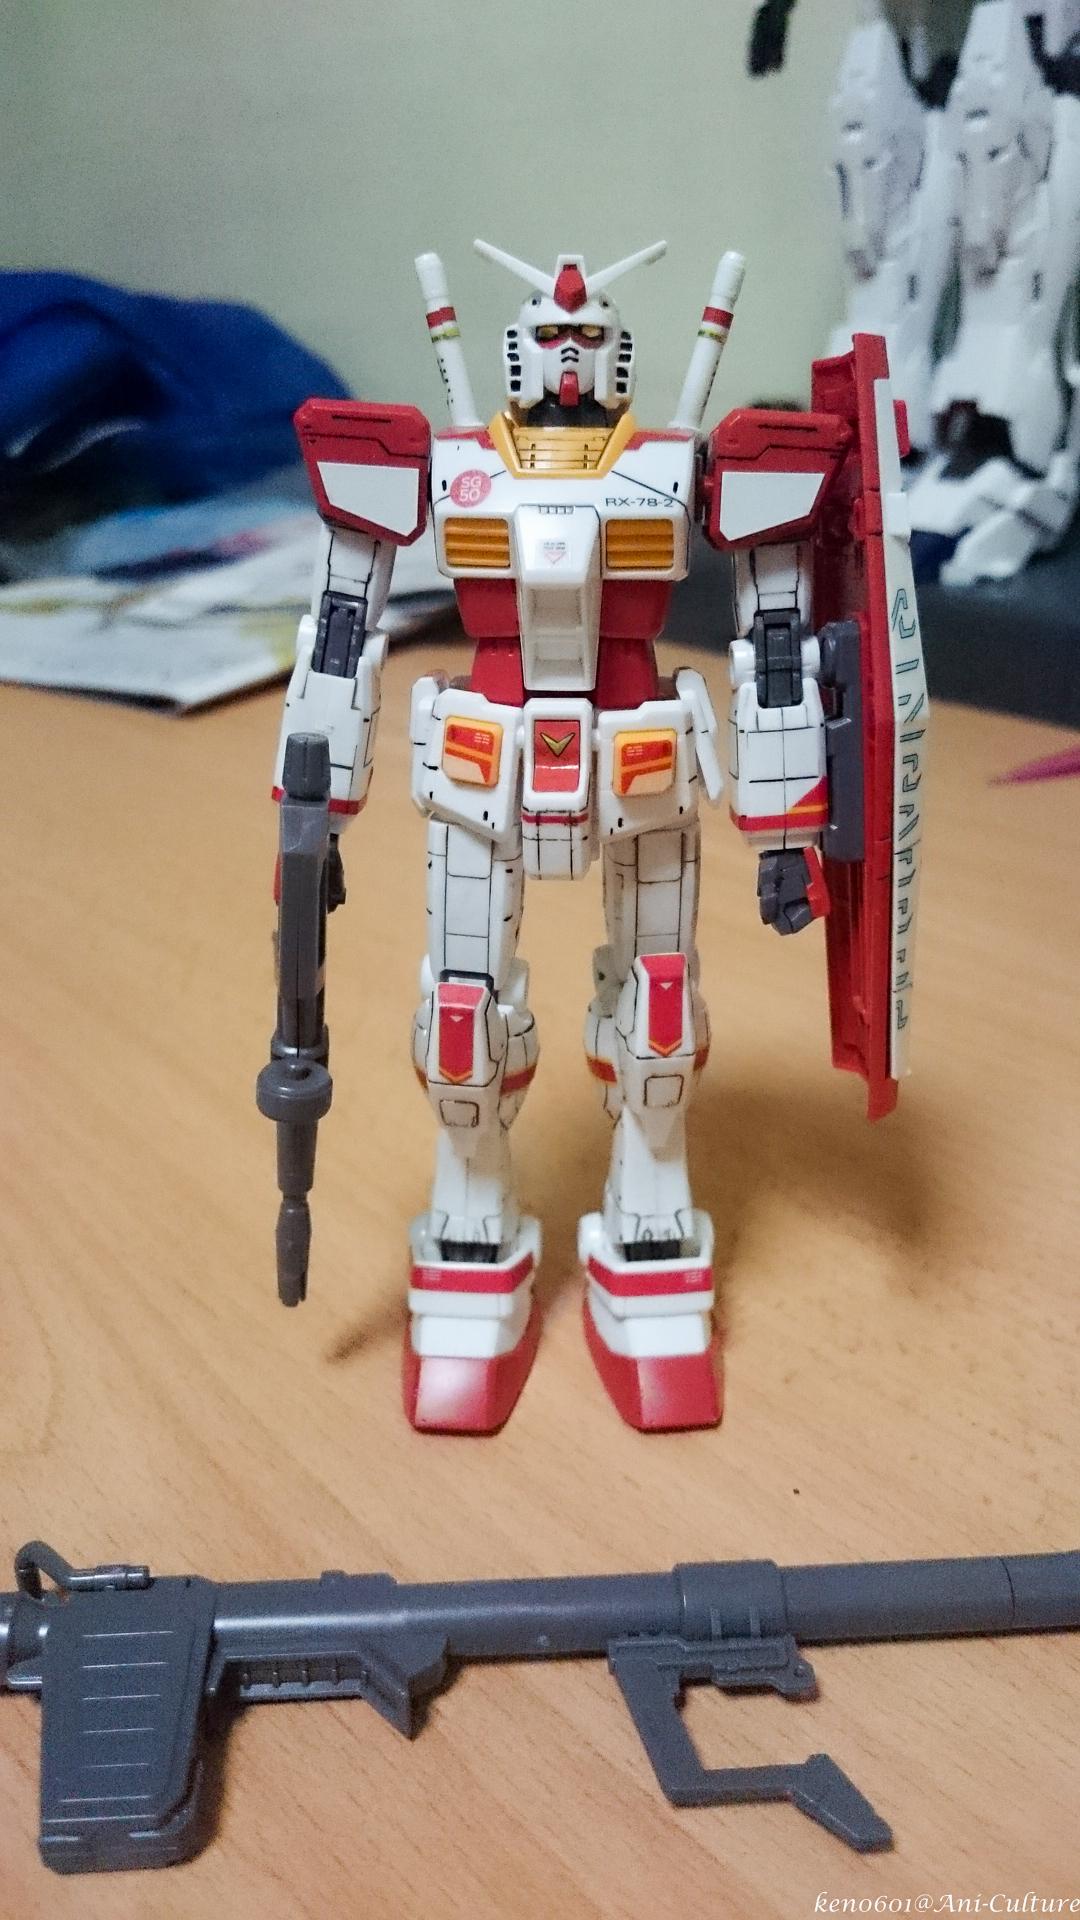 Gundam Docks at Singapore exclusive SG50 HG RX-78-2.